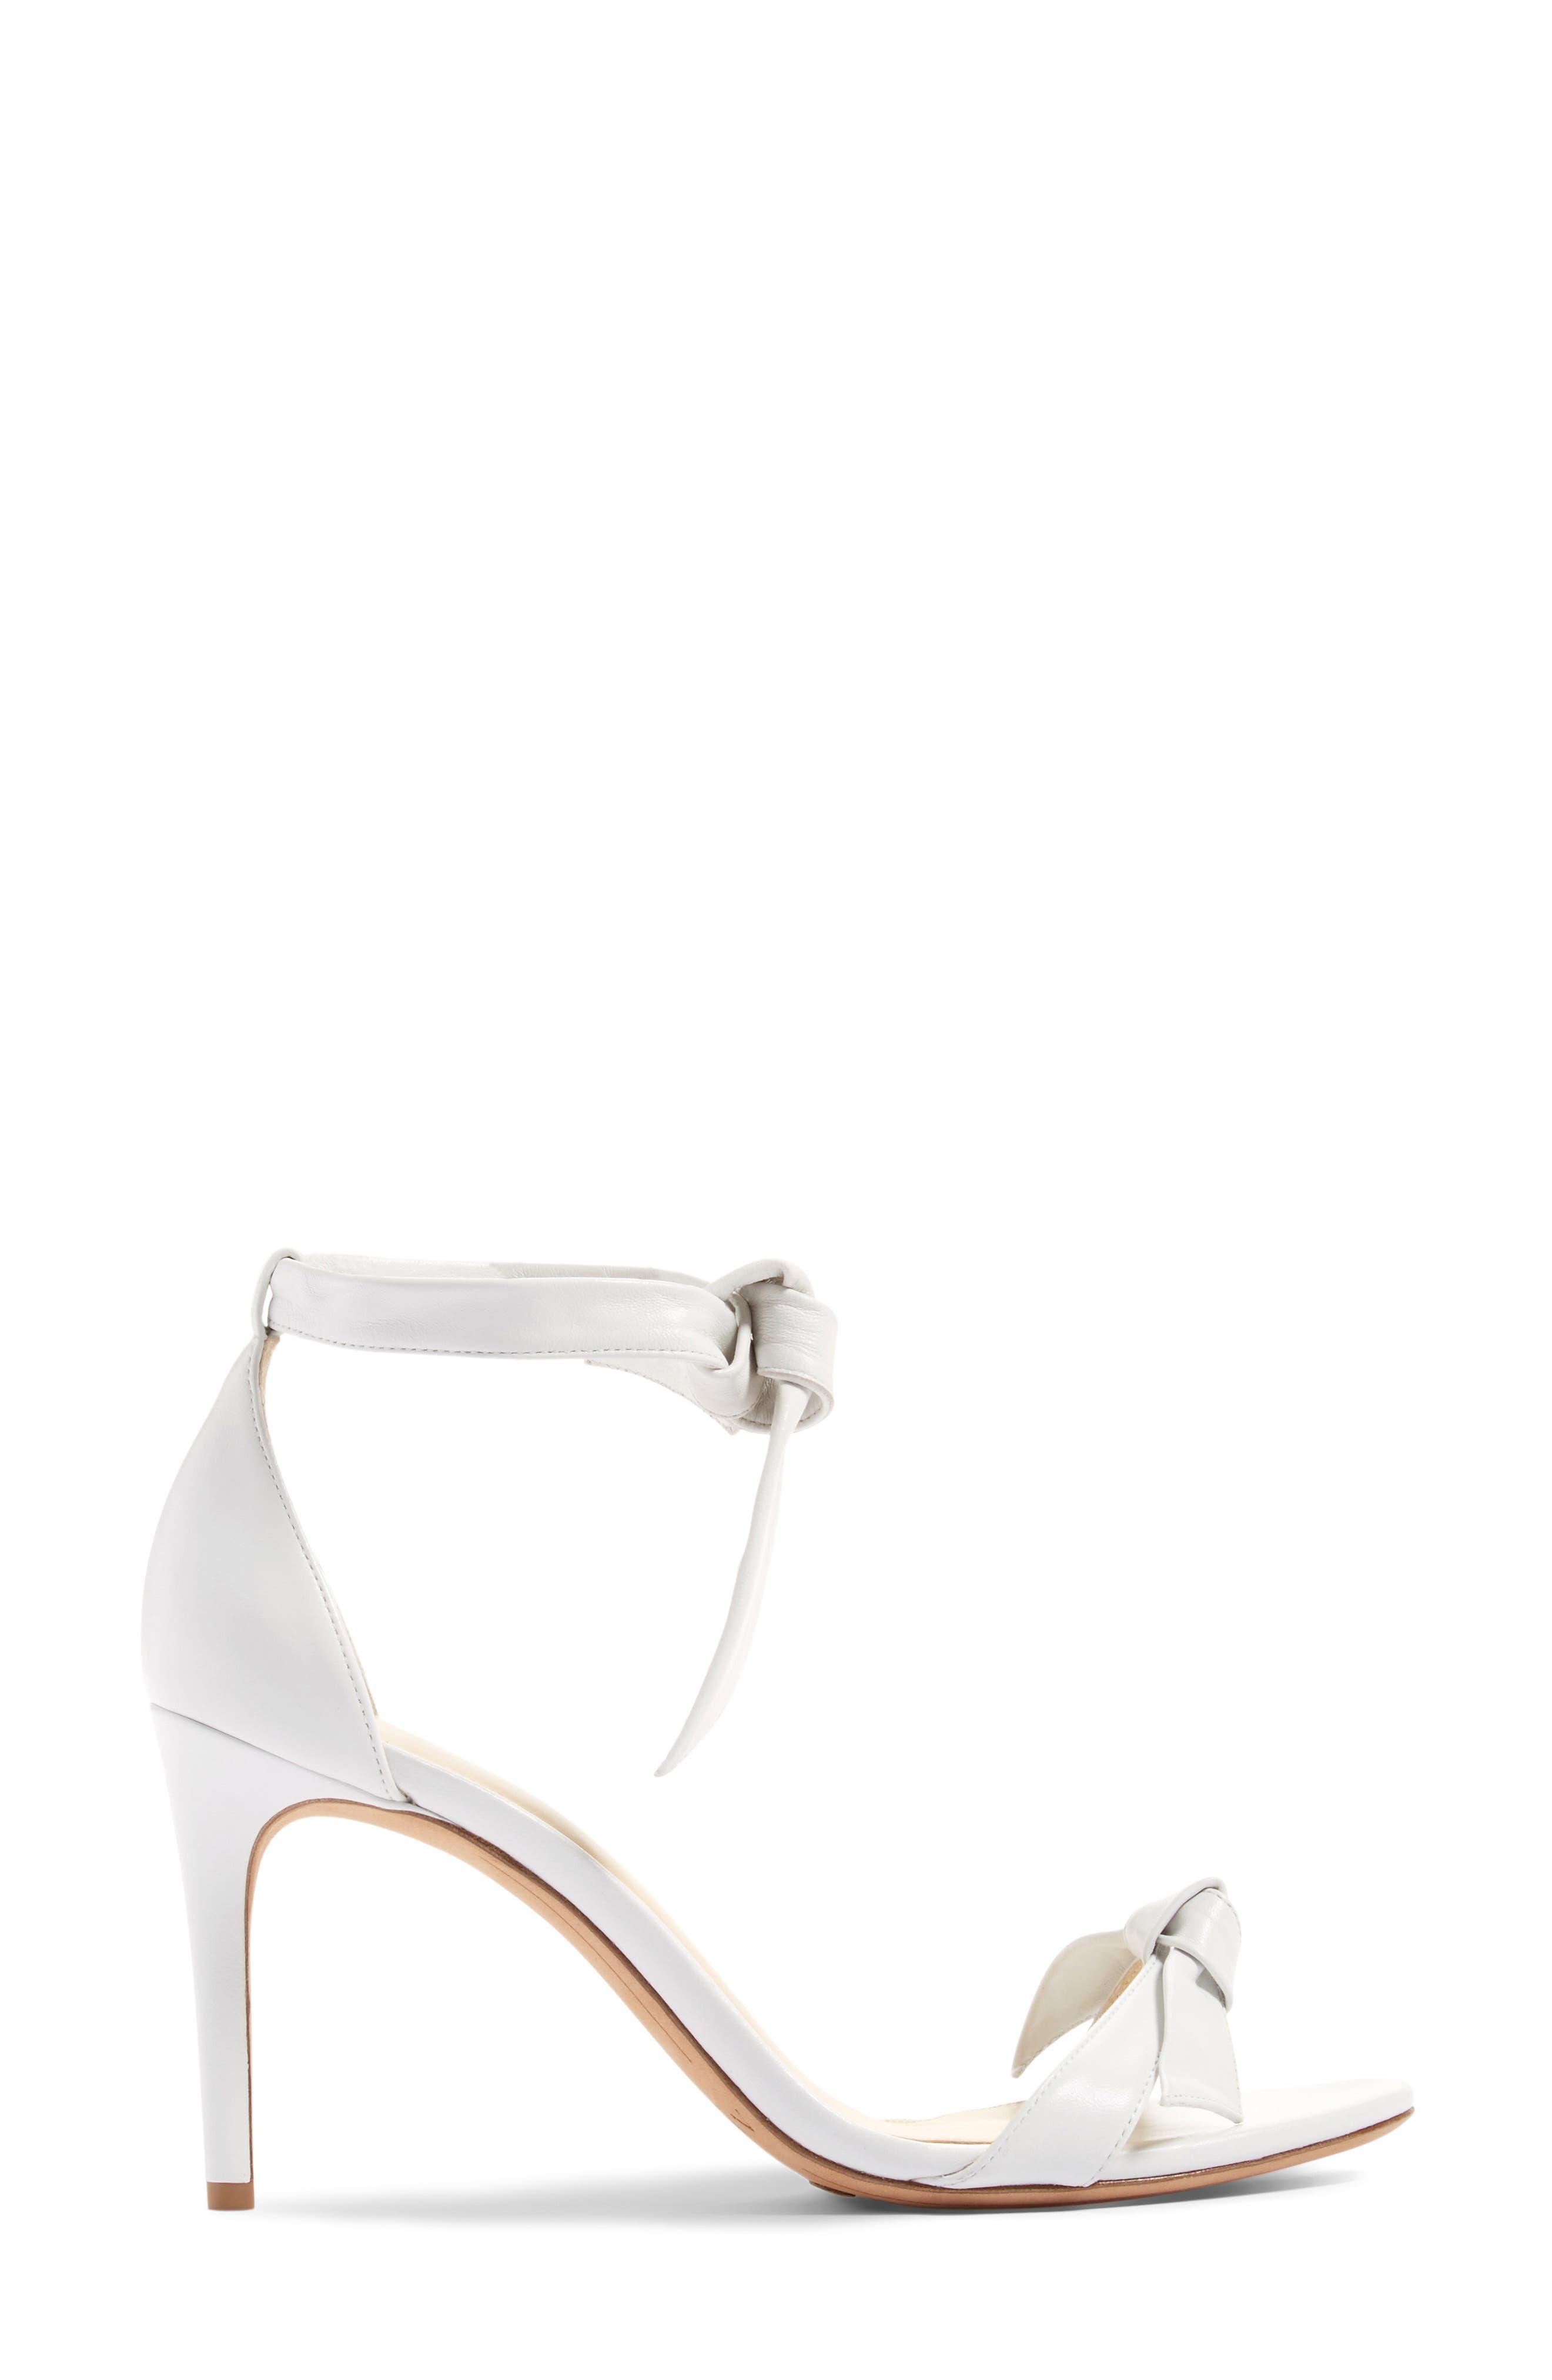 Clarita Ankle Tie Sandal,                             Alternate thumbnail 4, color,                             White Leather